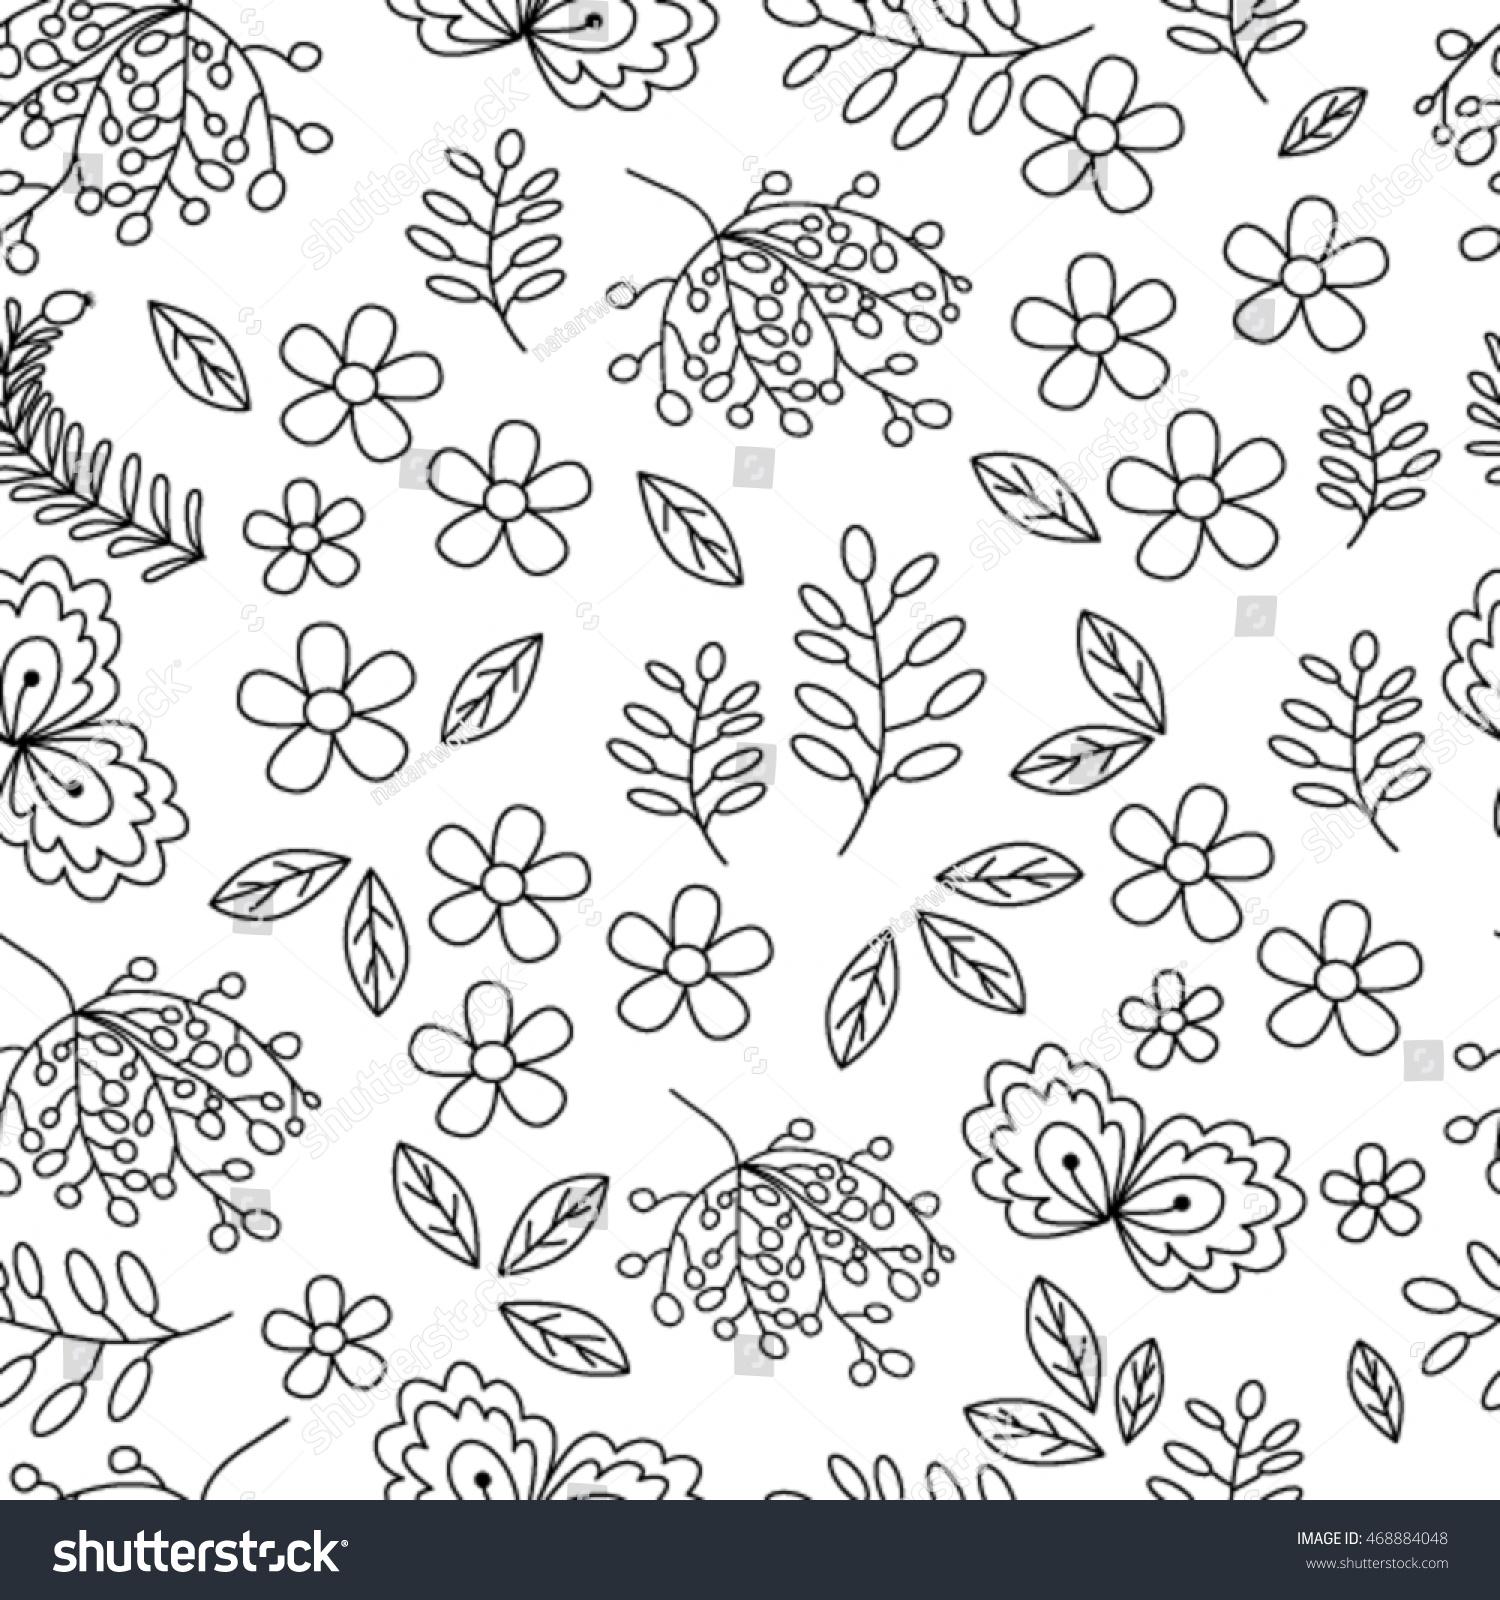 Seamless Pattern Flowers Leaves Black White Stock Vector